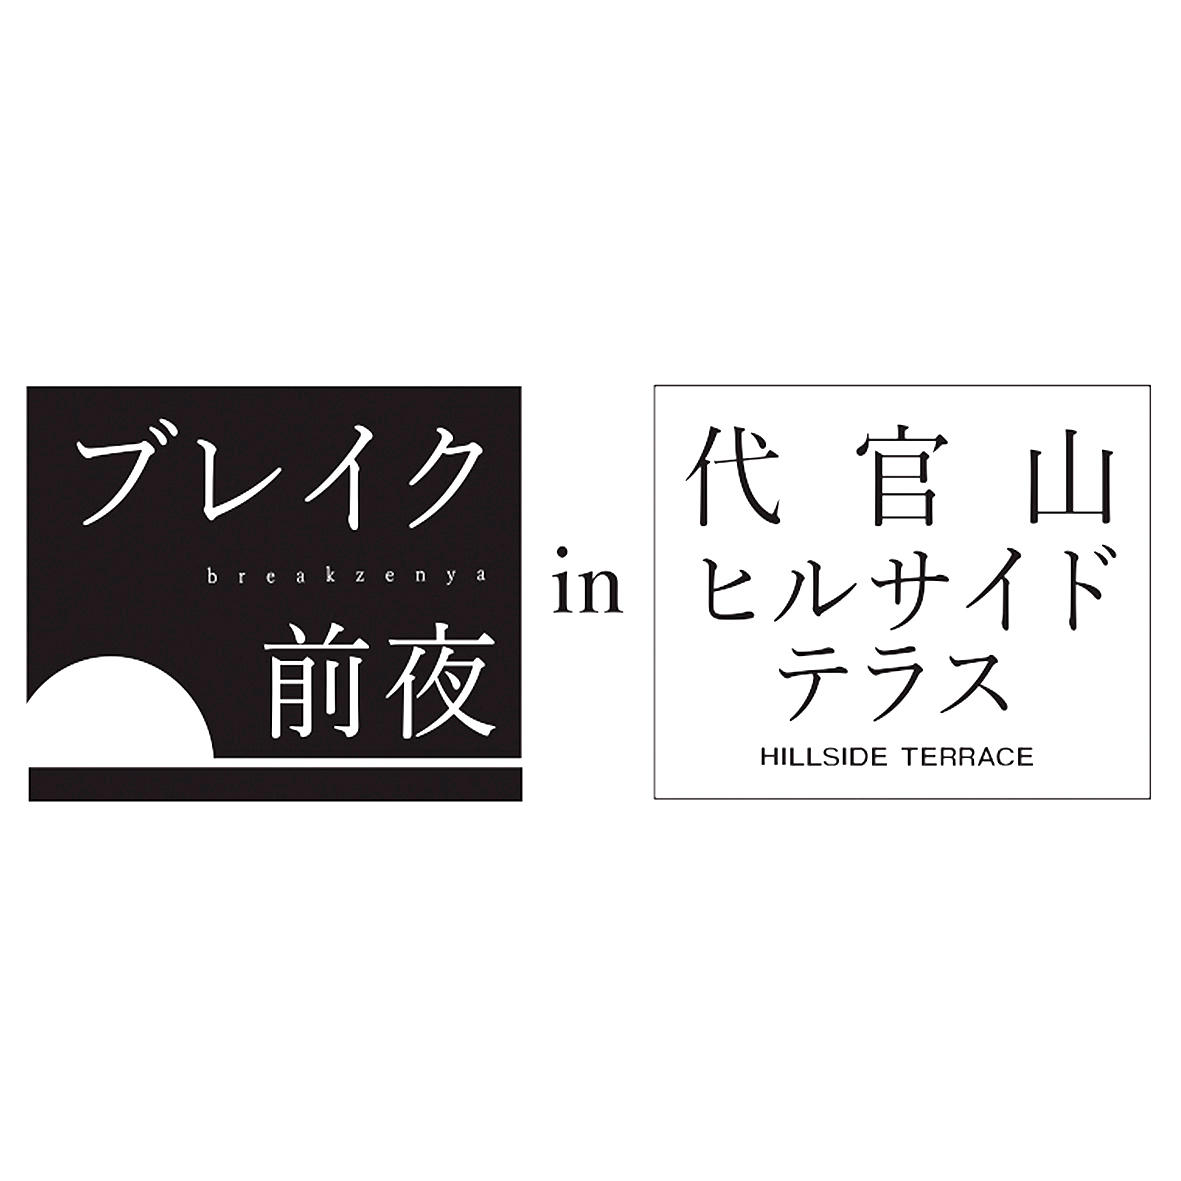 Chihiro Kabata, Kouseki Ono and Tokuro Sakamoto @  HILLSIDE FORUM, Daikanyama